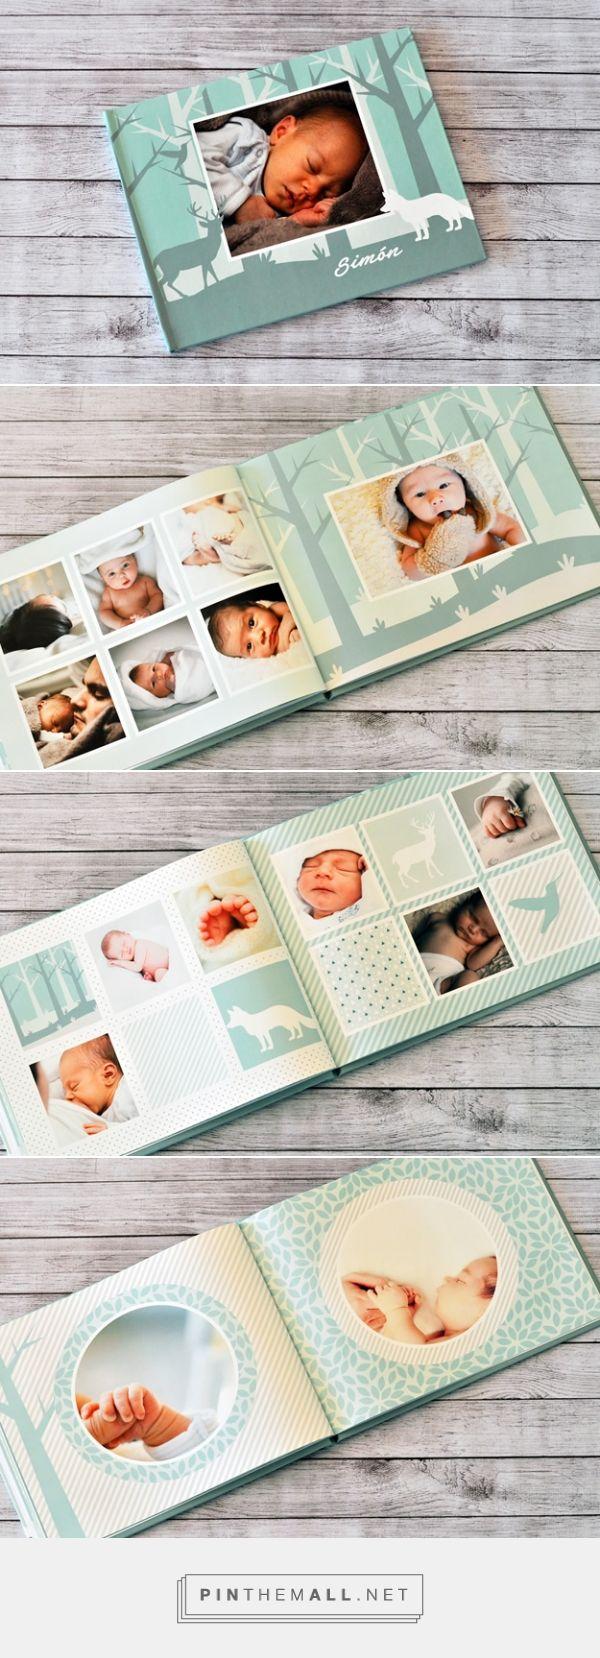 Alon Simón [versión Nene]: Diseño de Fotolibro para descargar Gratis y completar con tus fotos. | Blog - Fábrica de Fotolibros - created via https://pinthemall.net